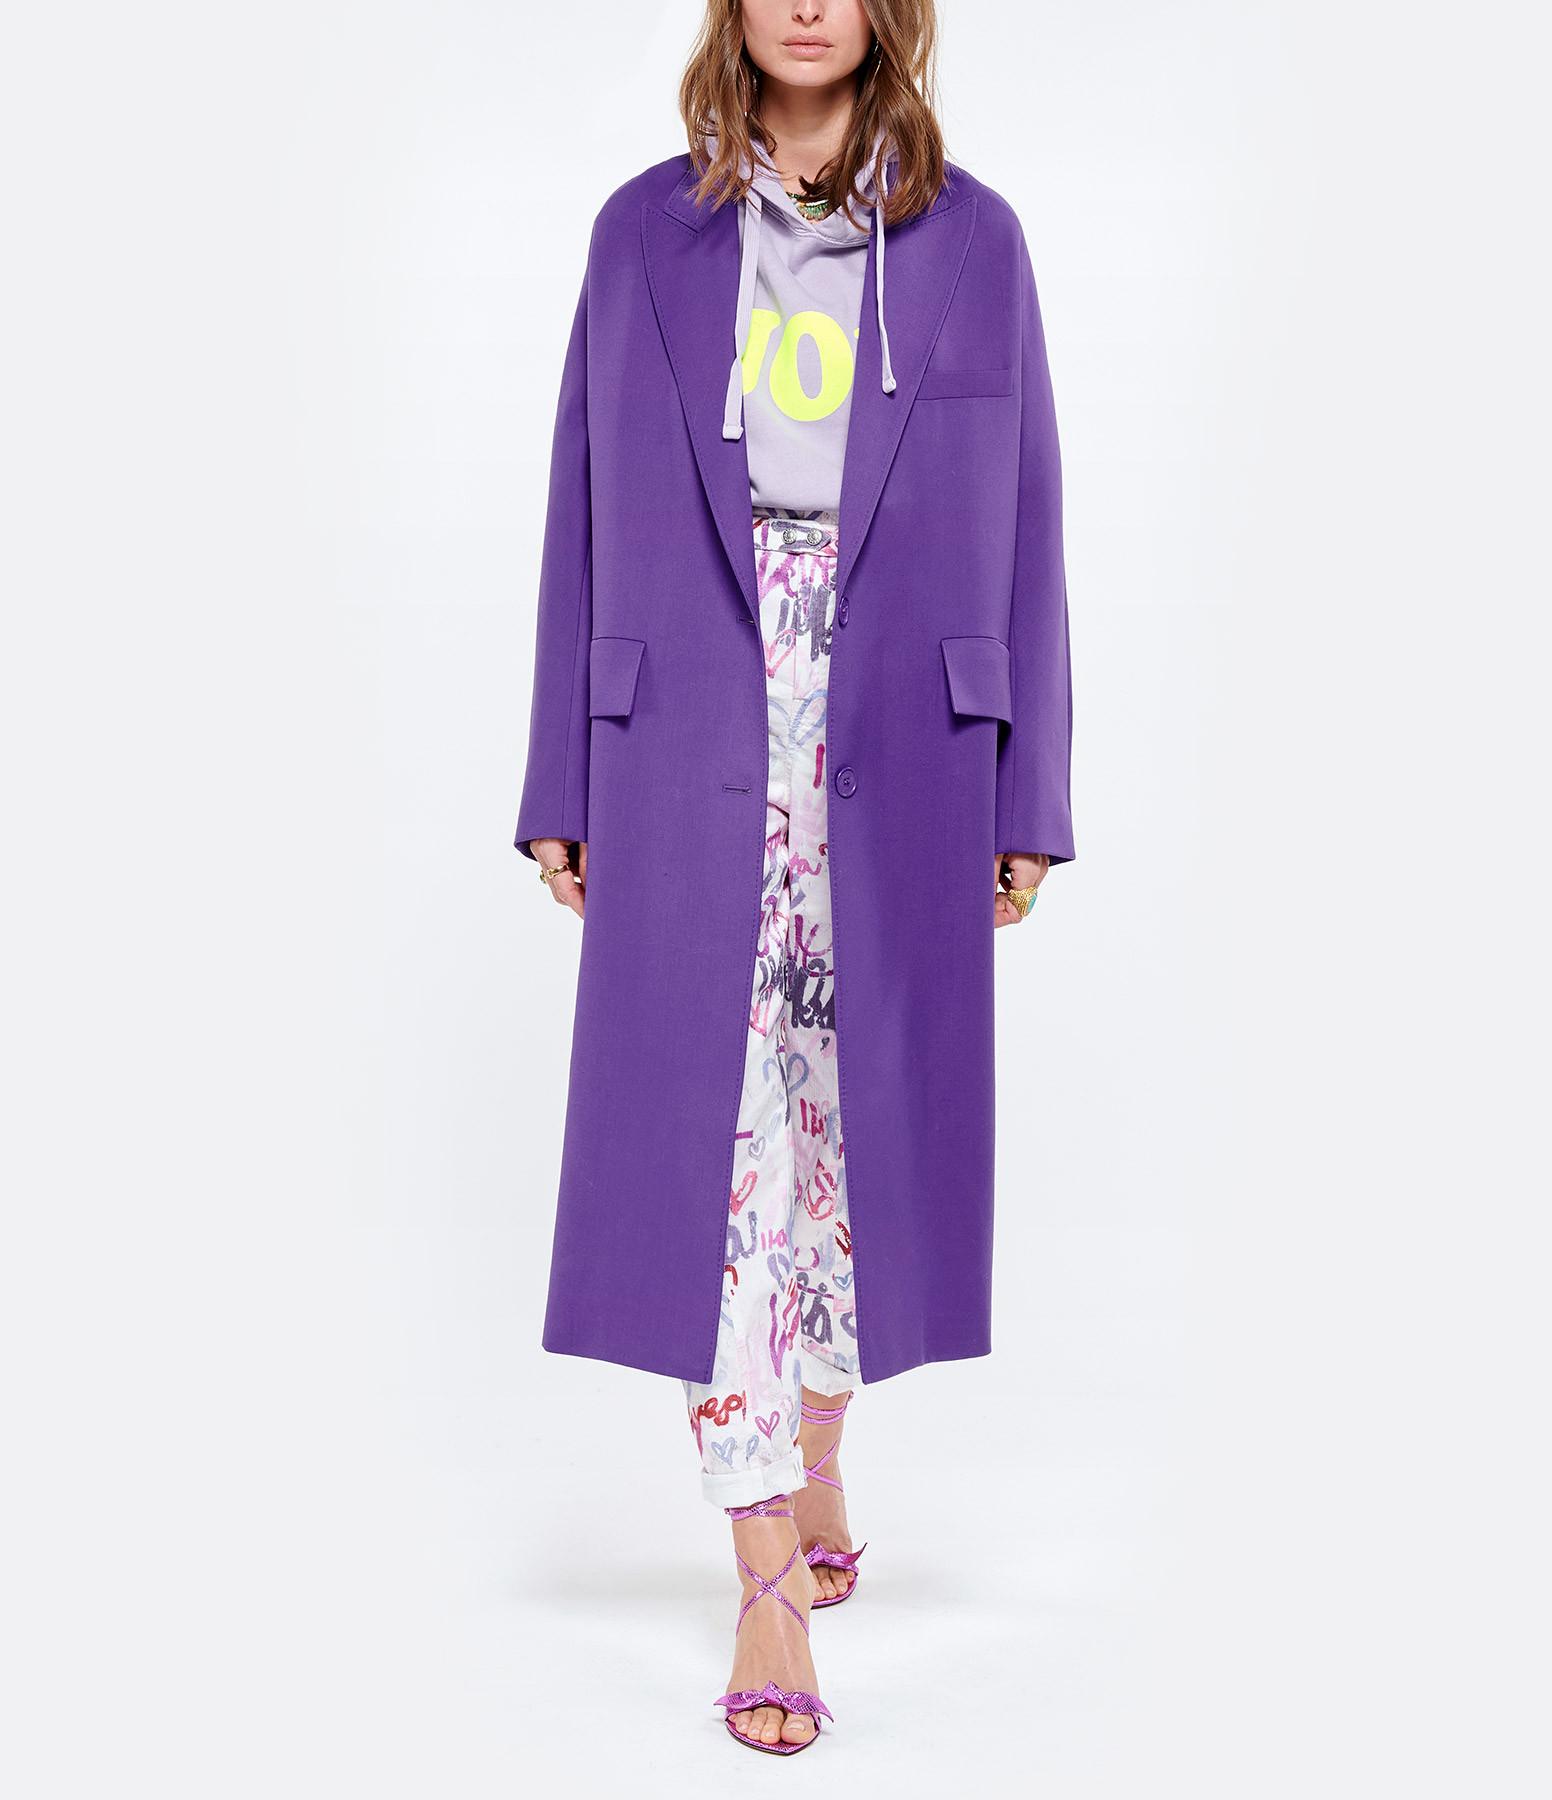 NEWTONE - Sweatshirt Hoodie Joy Coton Lilac